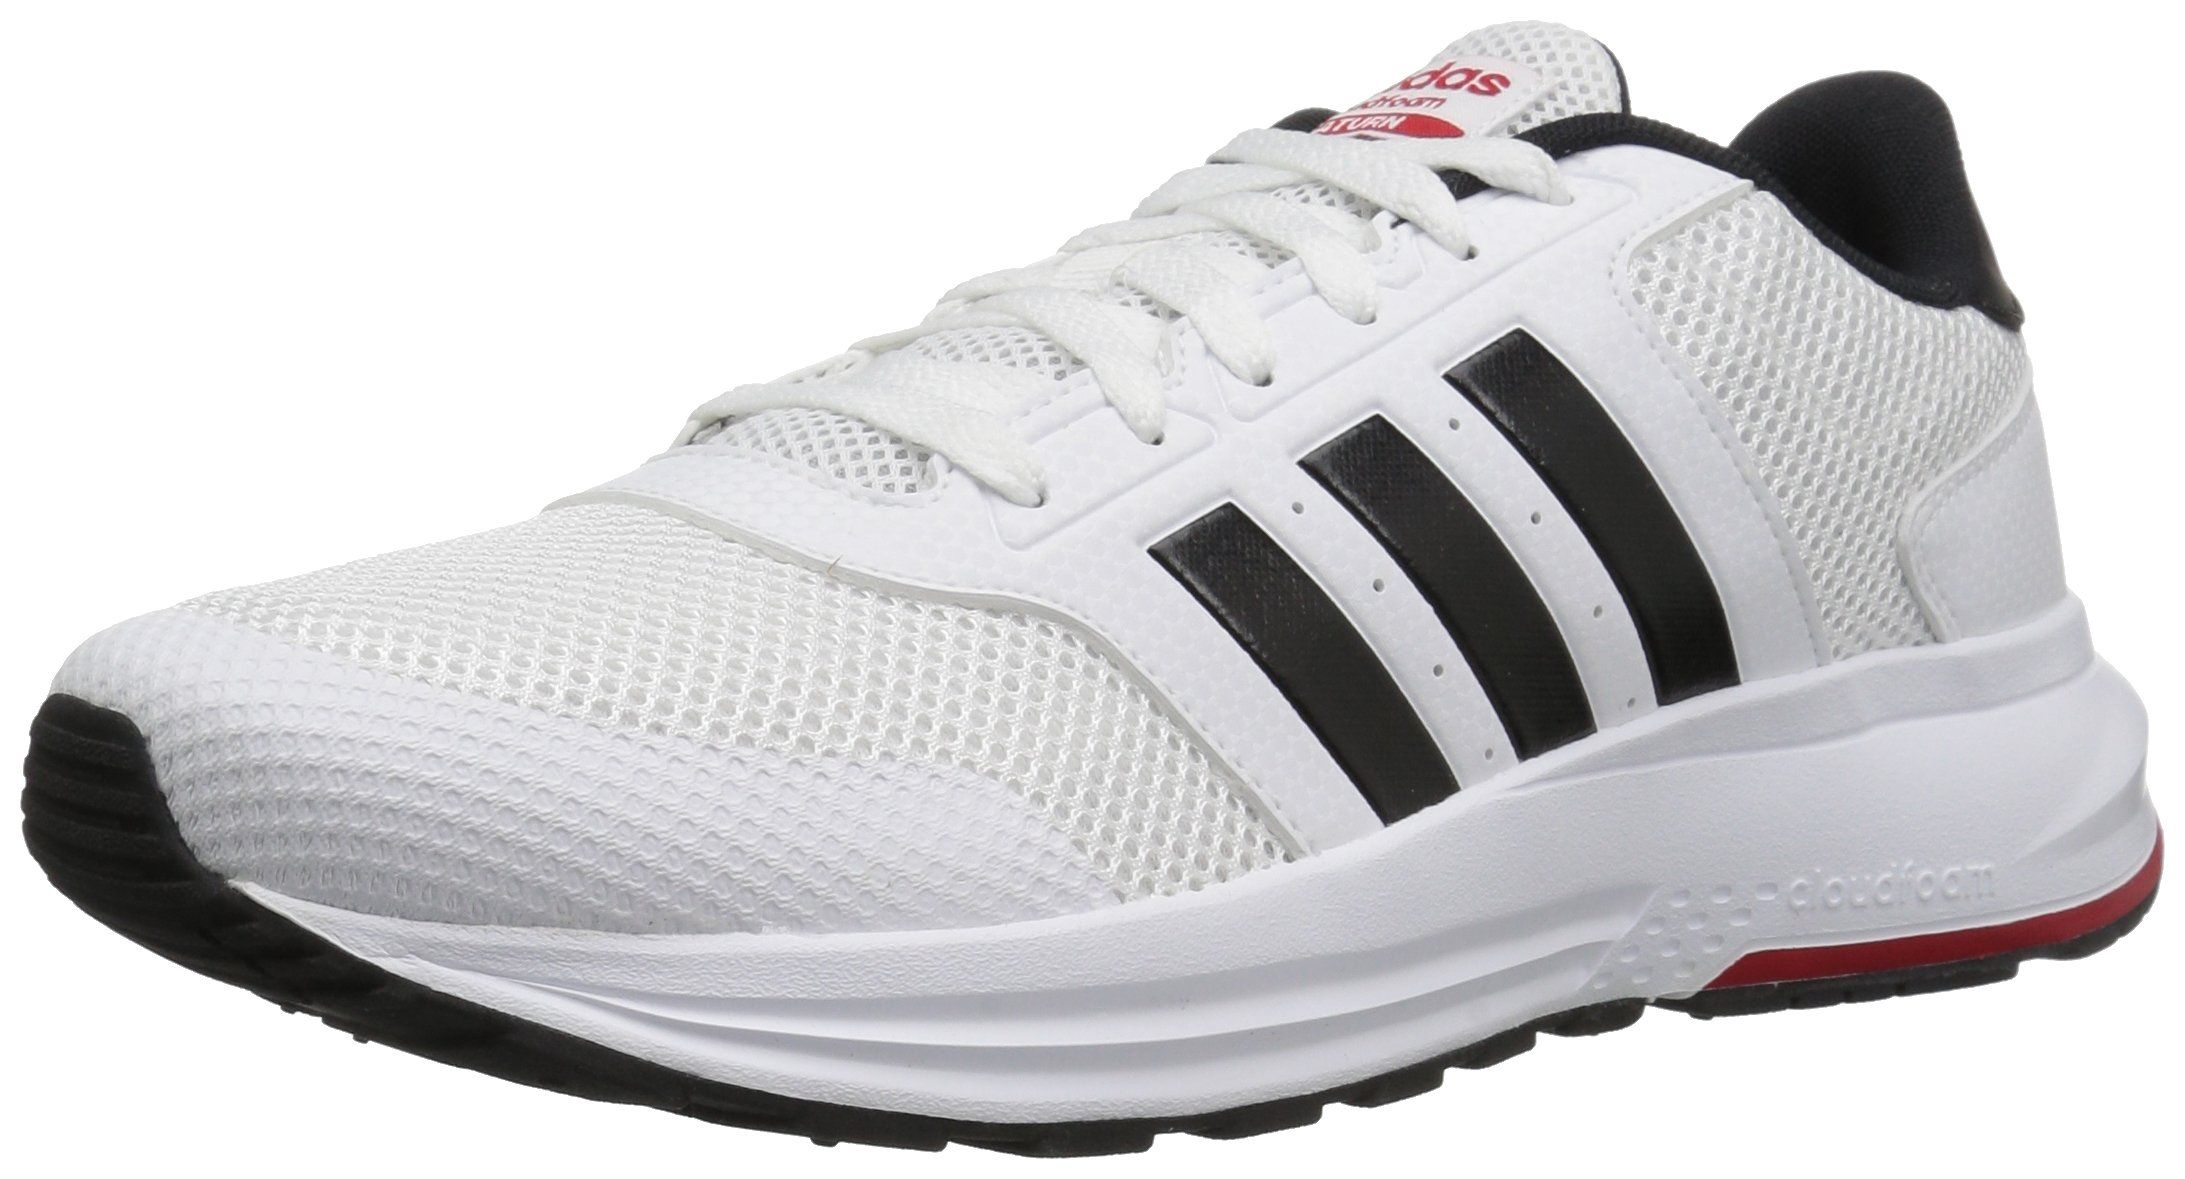 huge discount 8f5ba 531ee adidas NEO Mens Cloudfoam Saturn Running Shoe, WhiteBlackScarlet, 8.5 M